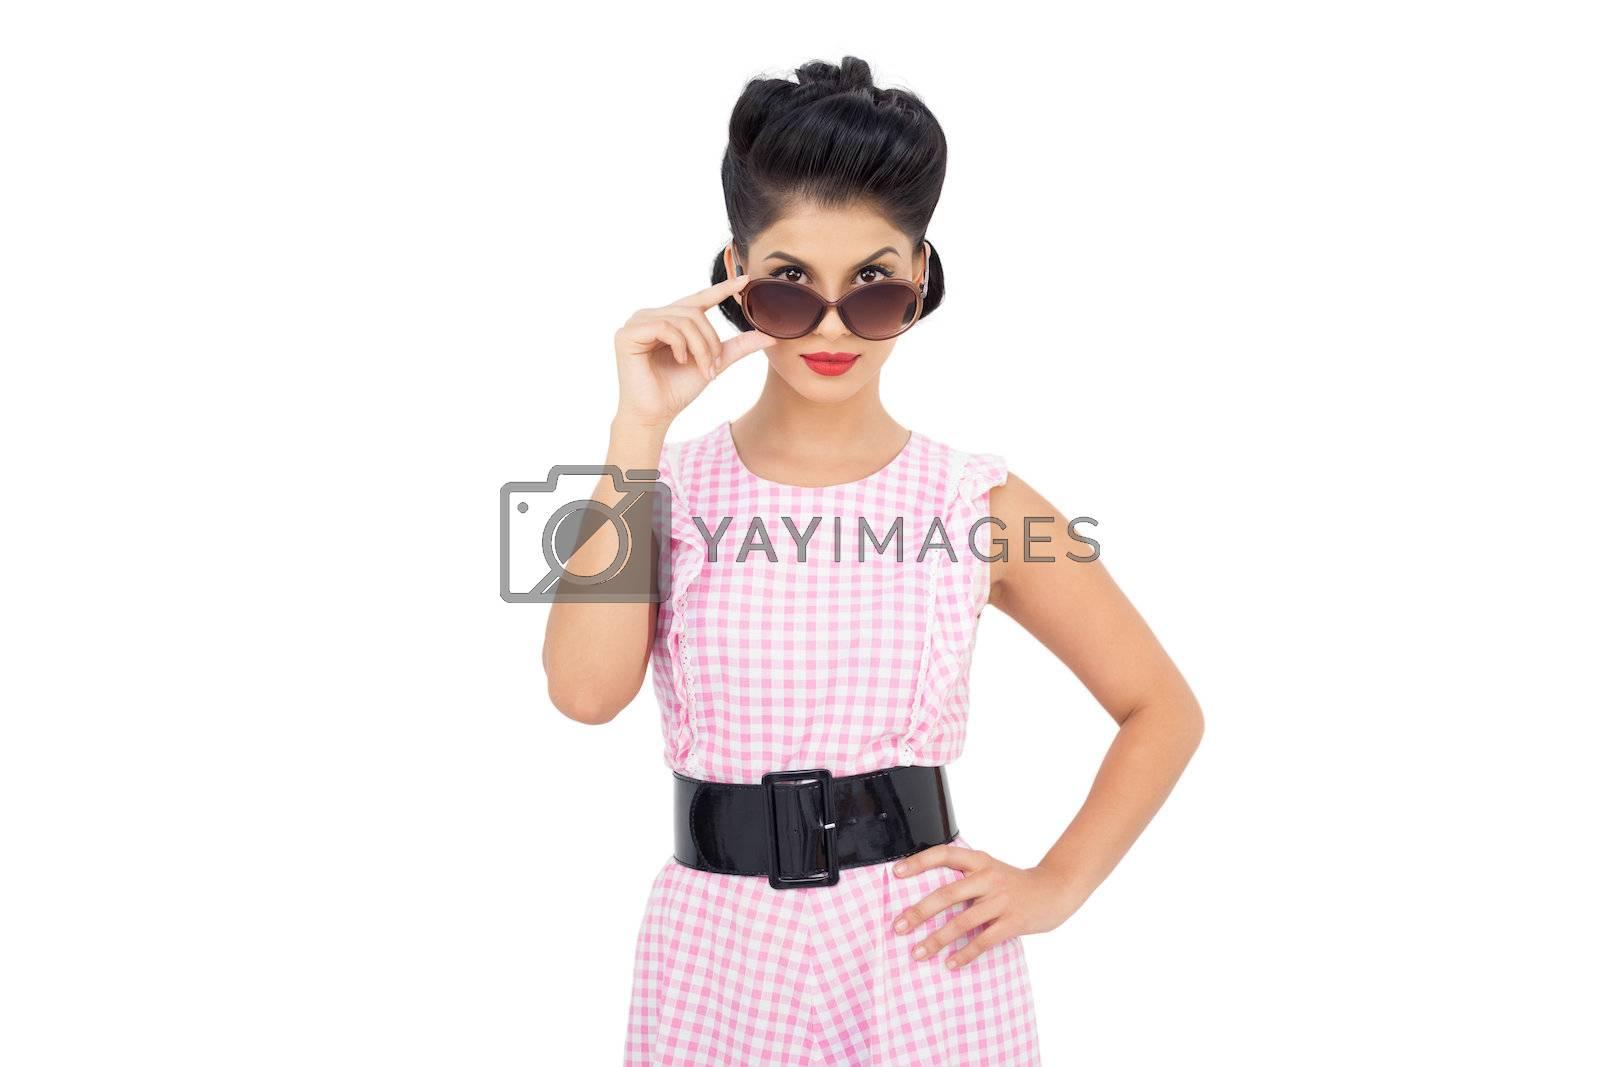 Pretty black hair model looking over her sunglasses by Wavebreakmedia